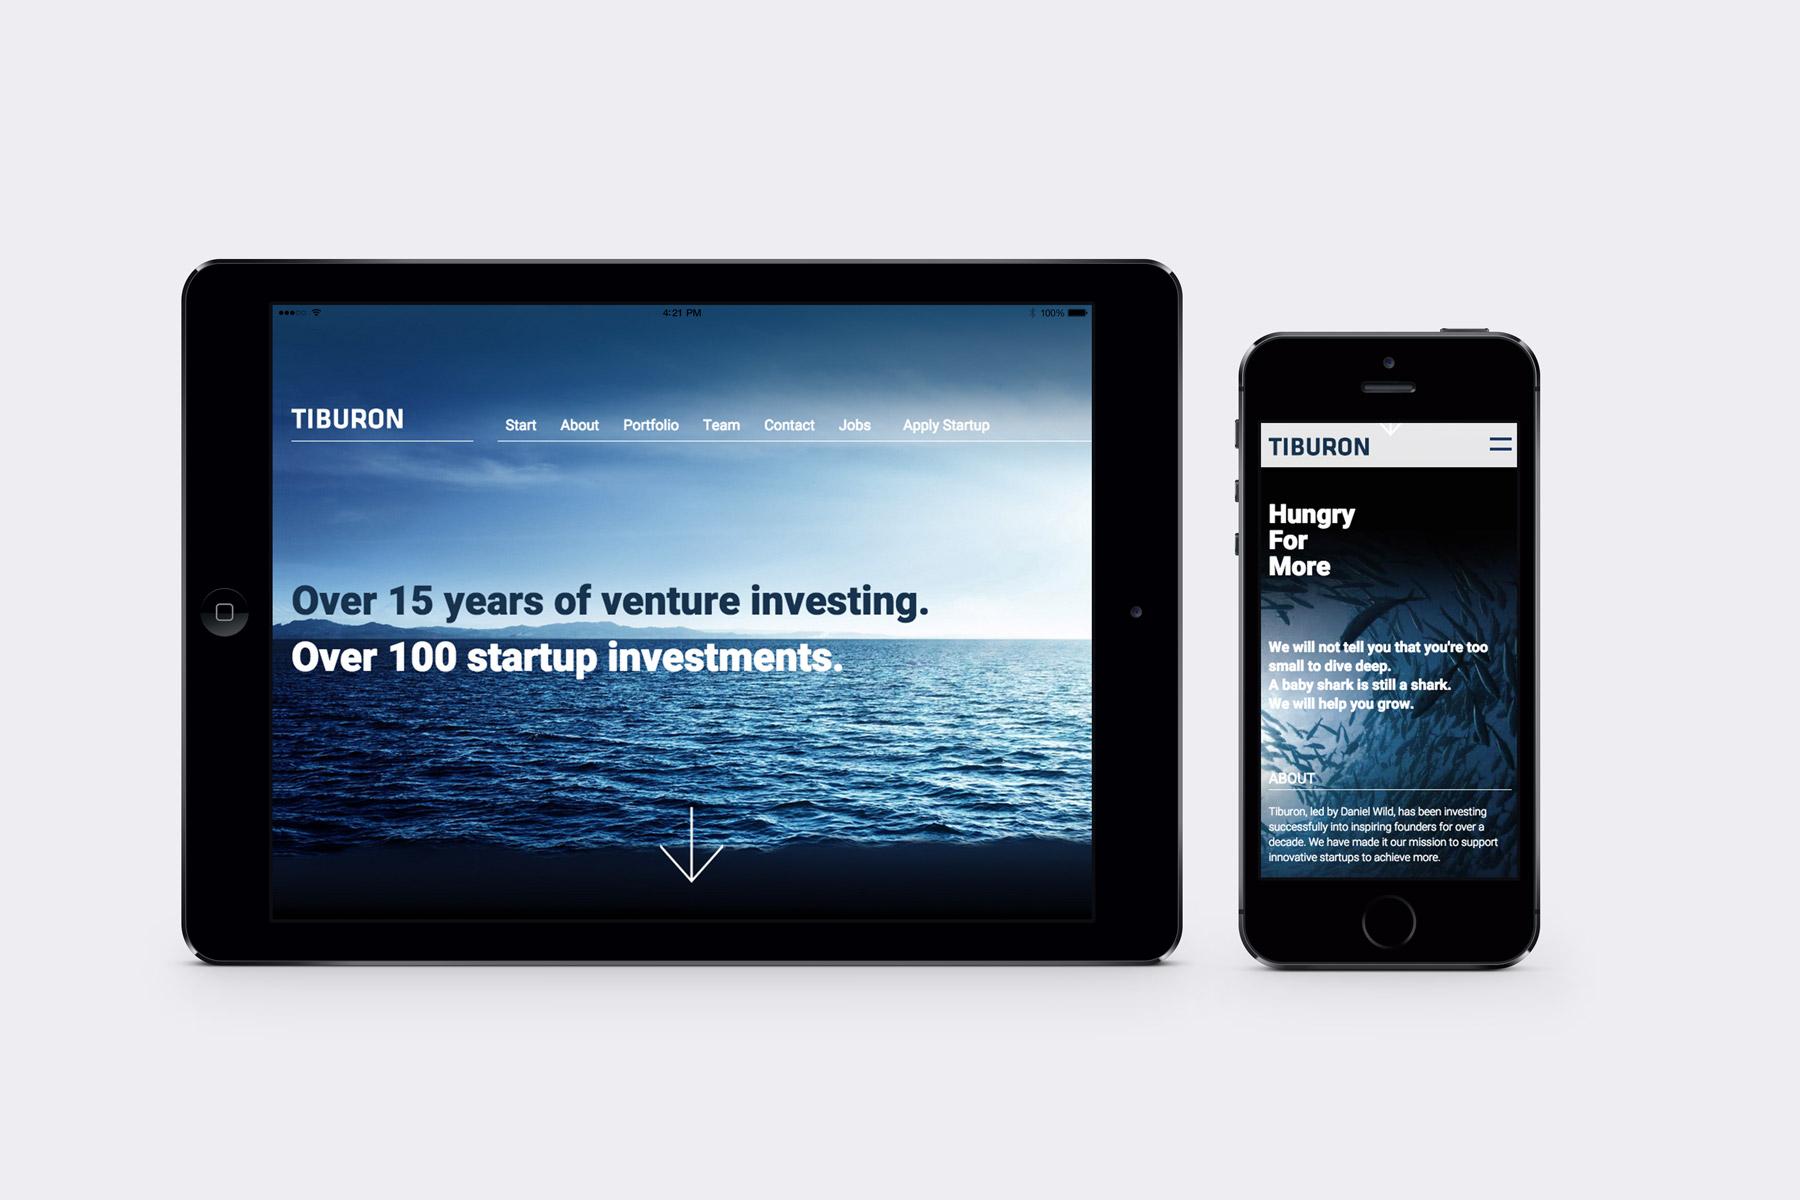 Tiburon Corporate Design